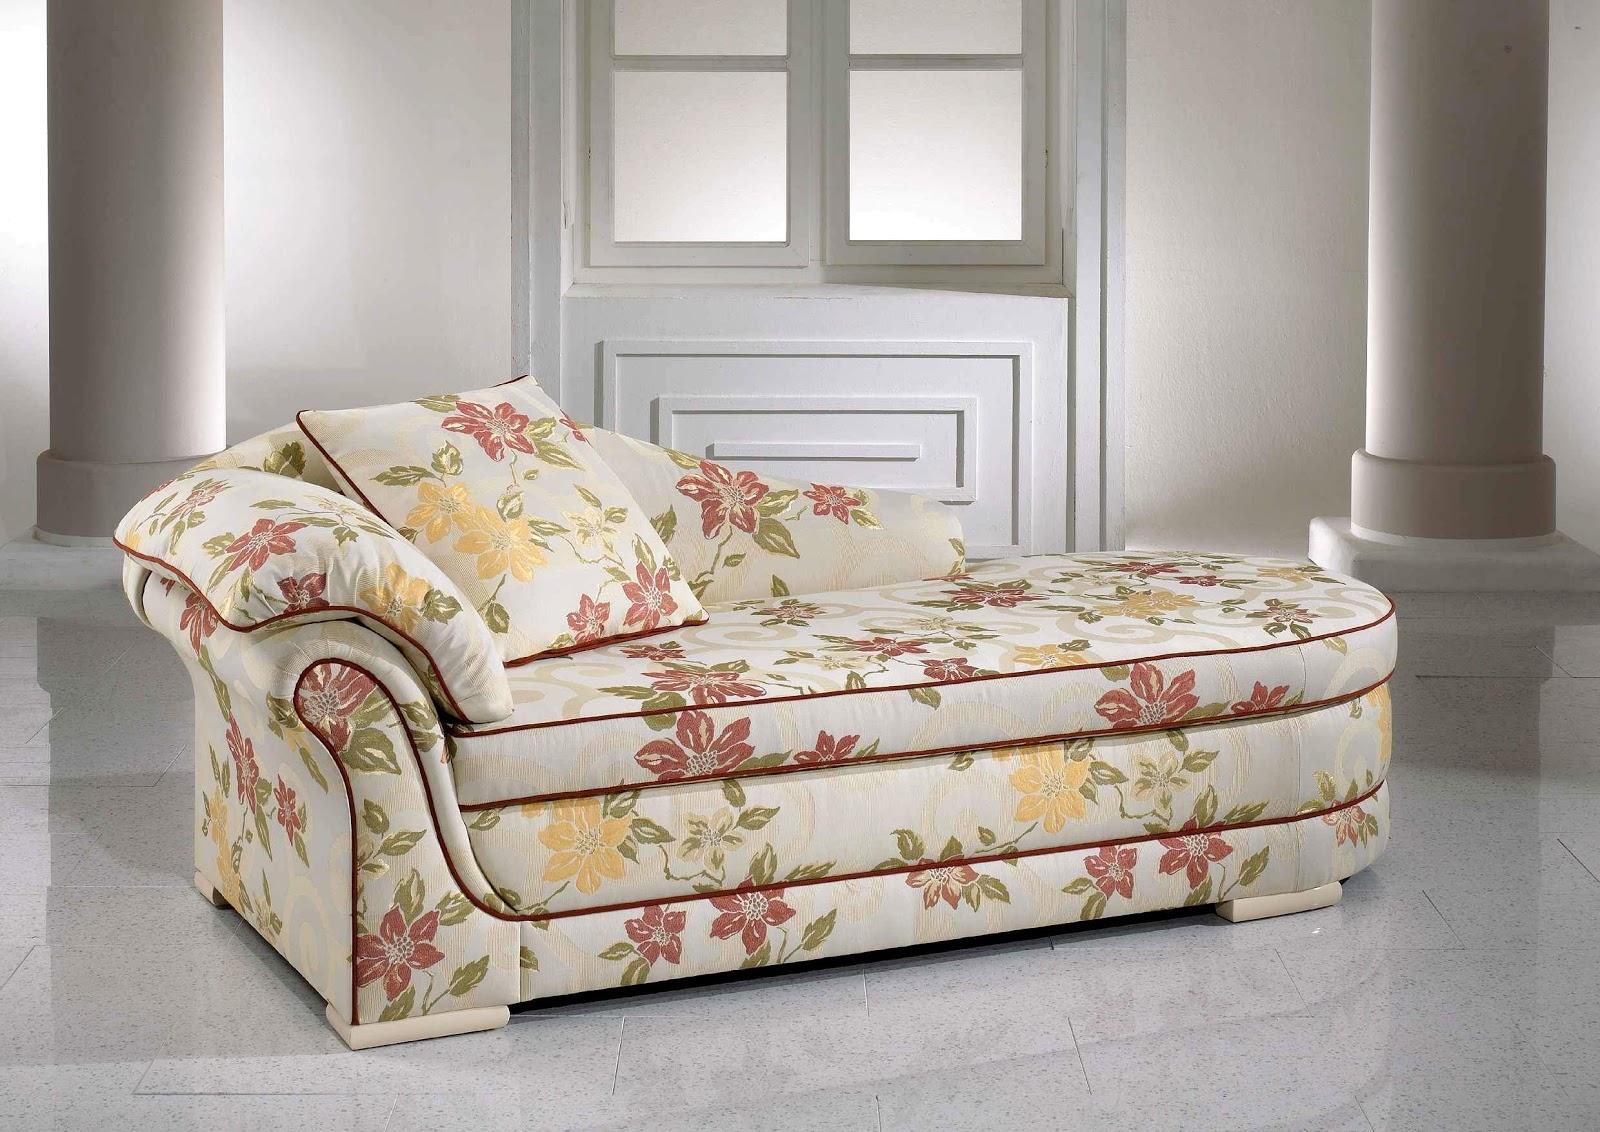 Modern Sofa Colourful Printed Fabric Designs Sofas38